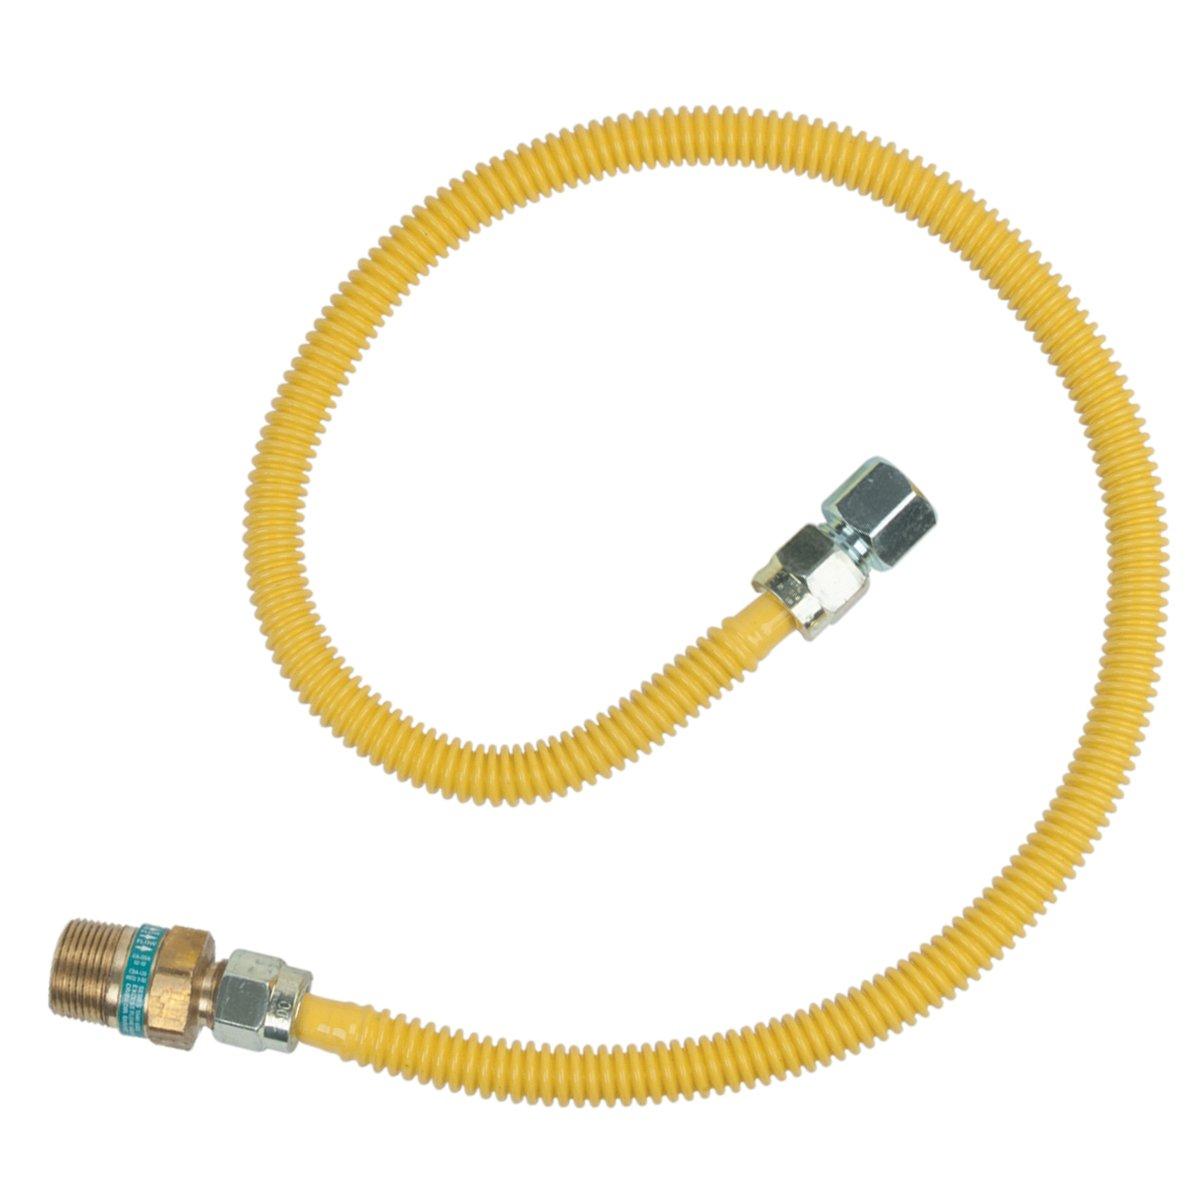 BrassCraft CSSD105R-36 P Safety PLUS Gas 1/2'' OD Connector with 1/2'' Female Flare EFV x 1/2'' FIP x 36''